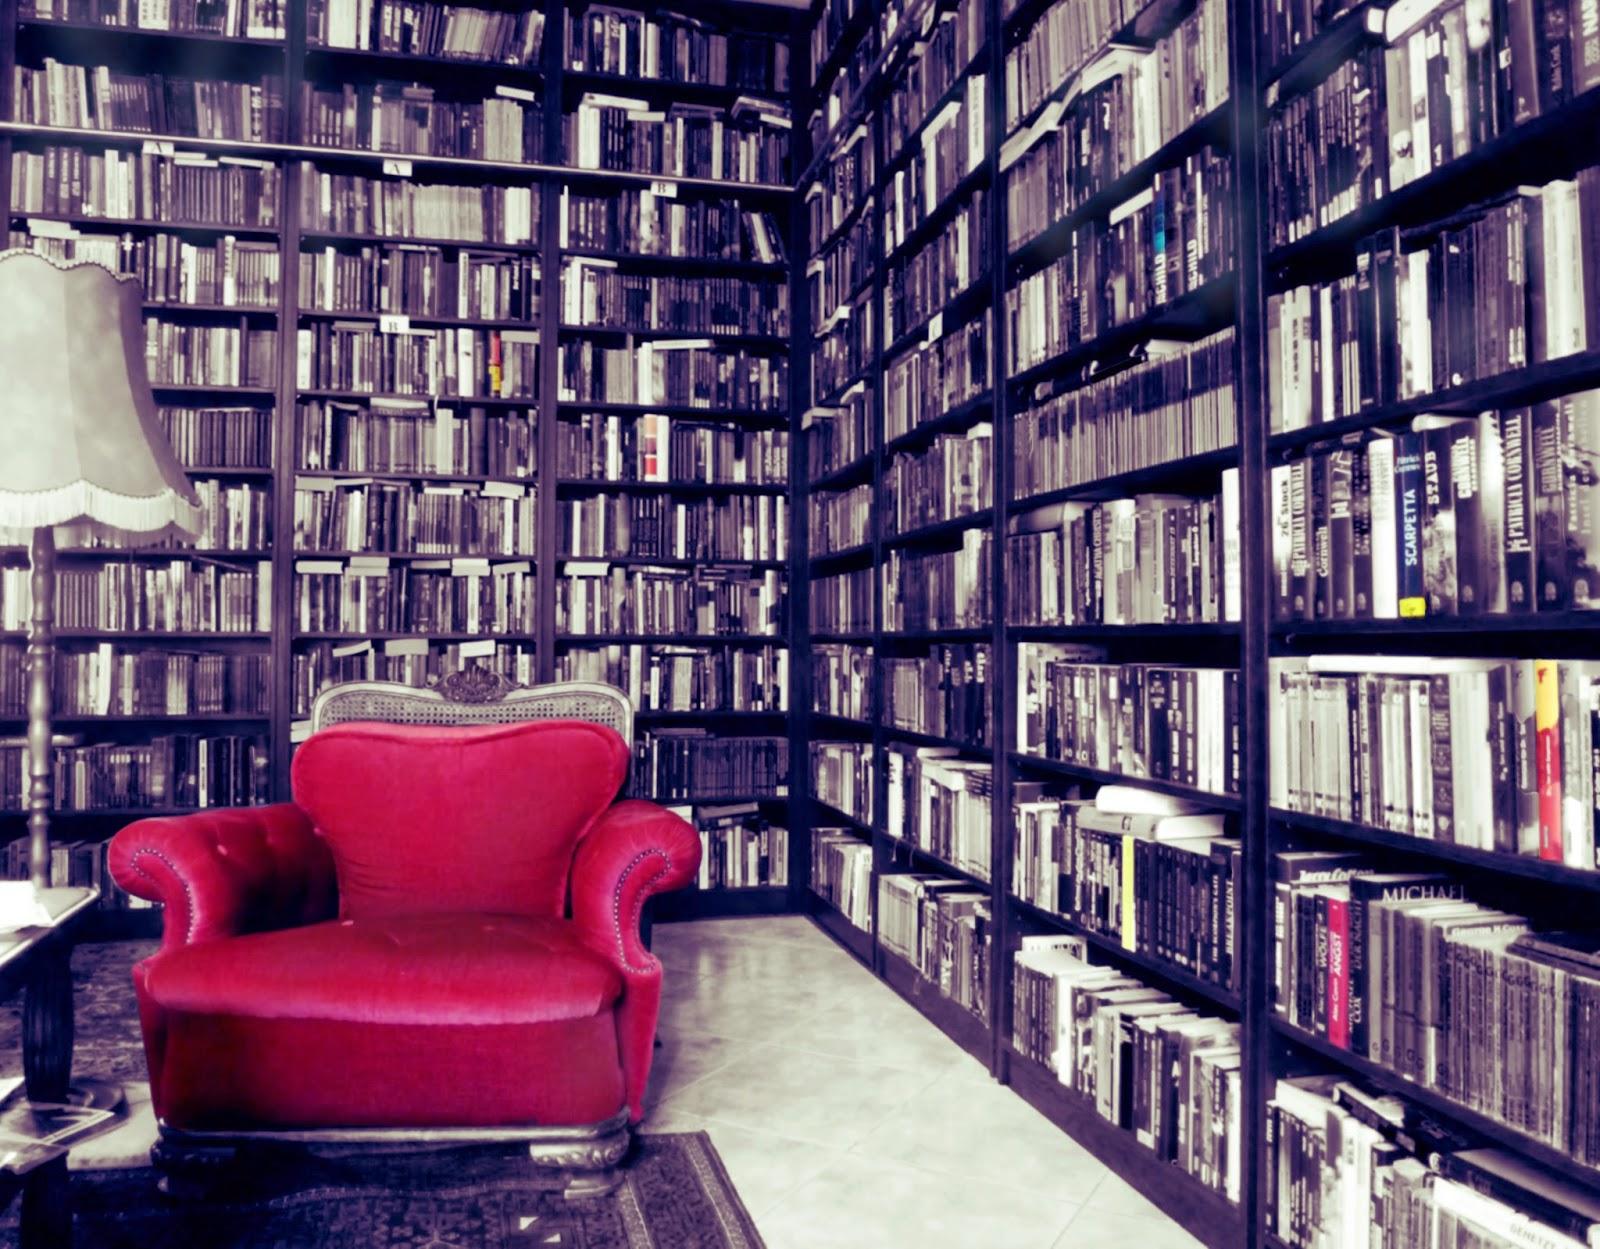 leben mit b chern 33. Black Bedroom Furniture Sets. Home Design Ideas